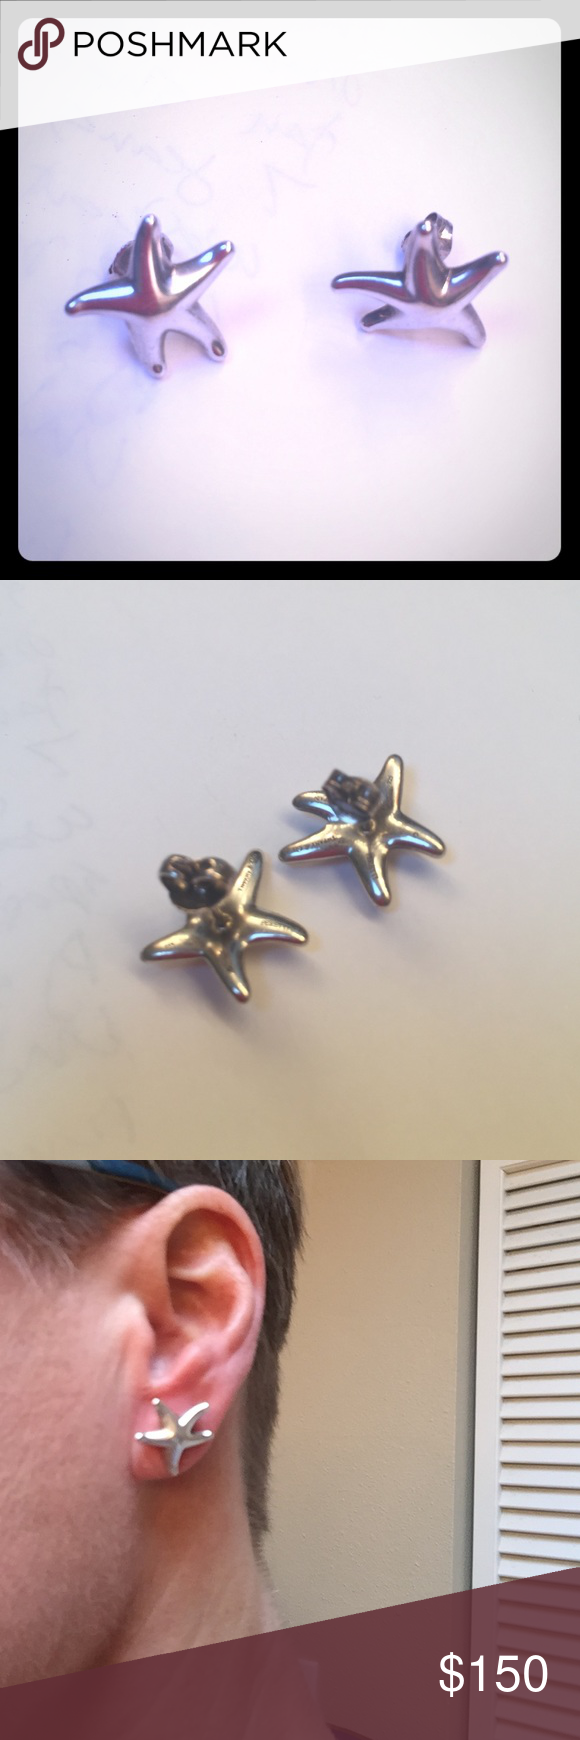 Paloma Picasso Tiffany silver earrings Silver Tiffany earrings from their Paloma Picasso collection Tiffany & Co. Jewelry Earrings